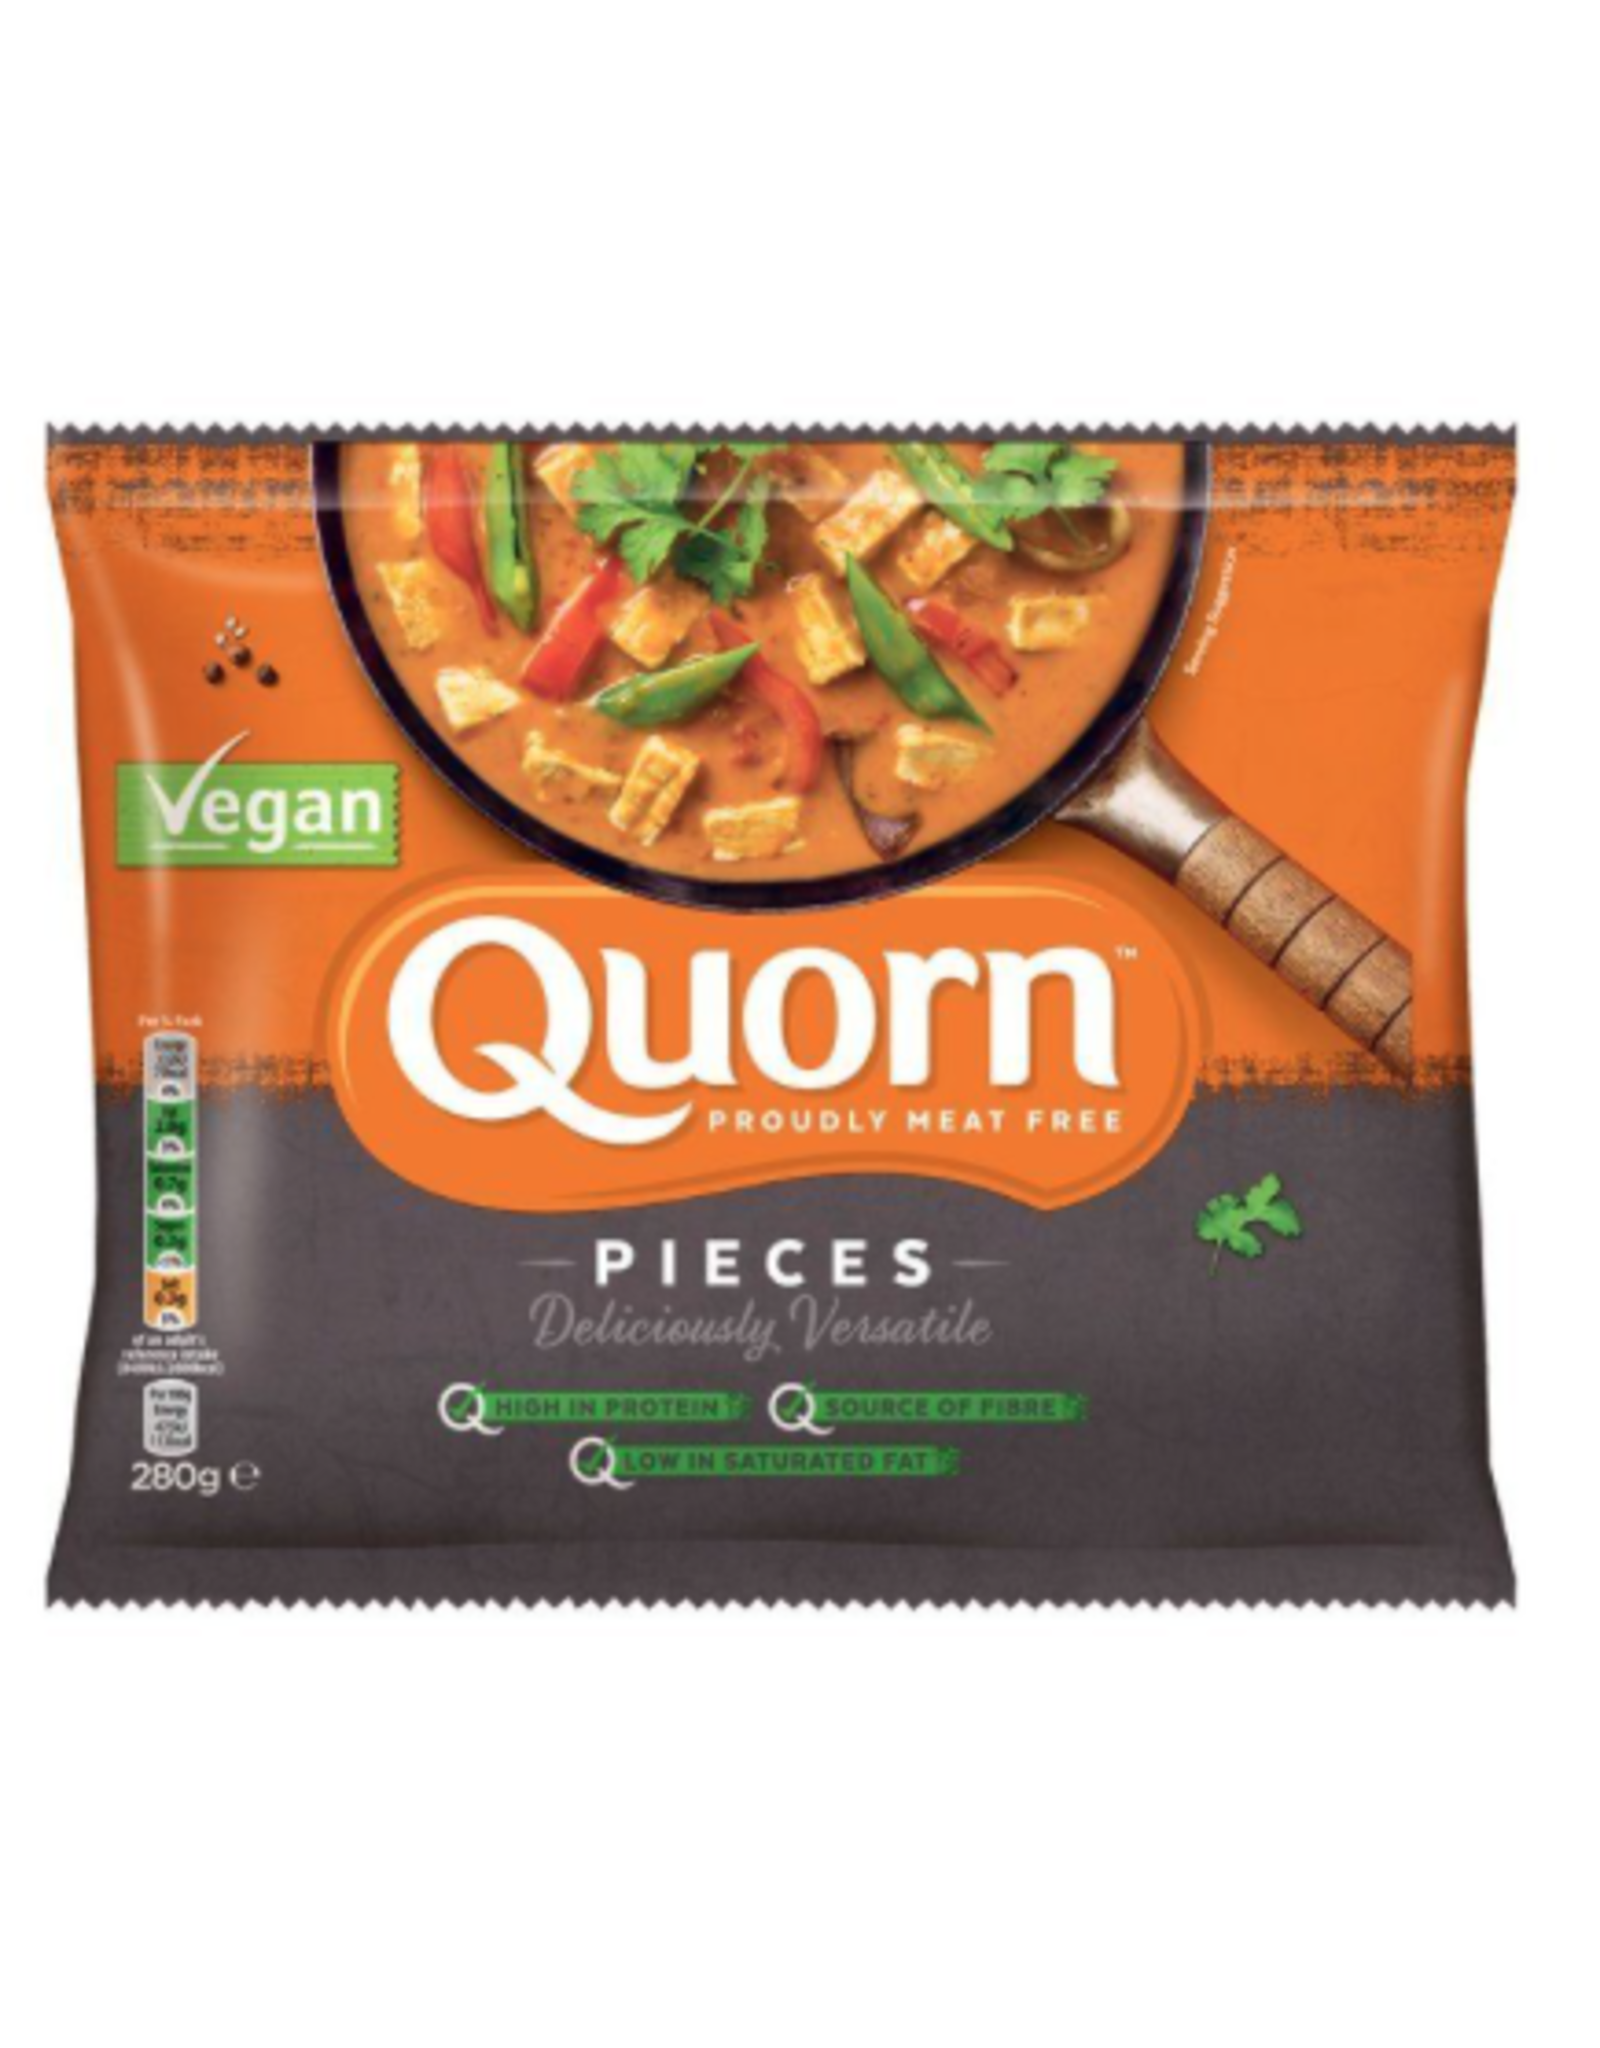 Quorn Veganer-Stückchen, 280g  ❄️❄️❄️